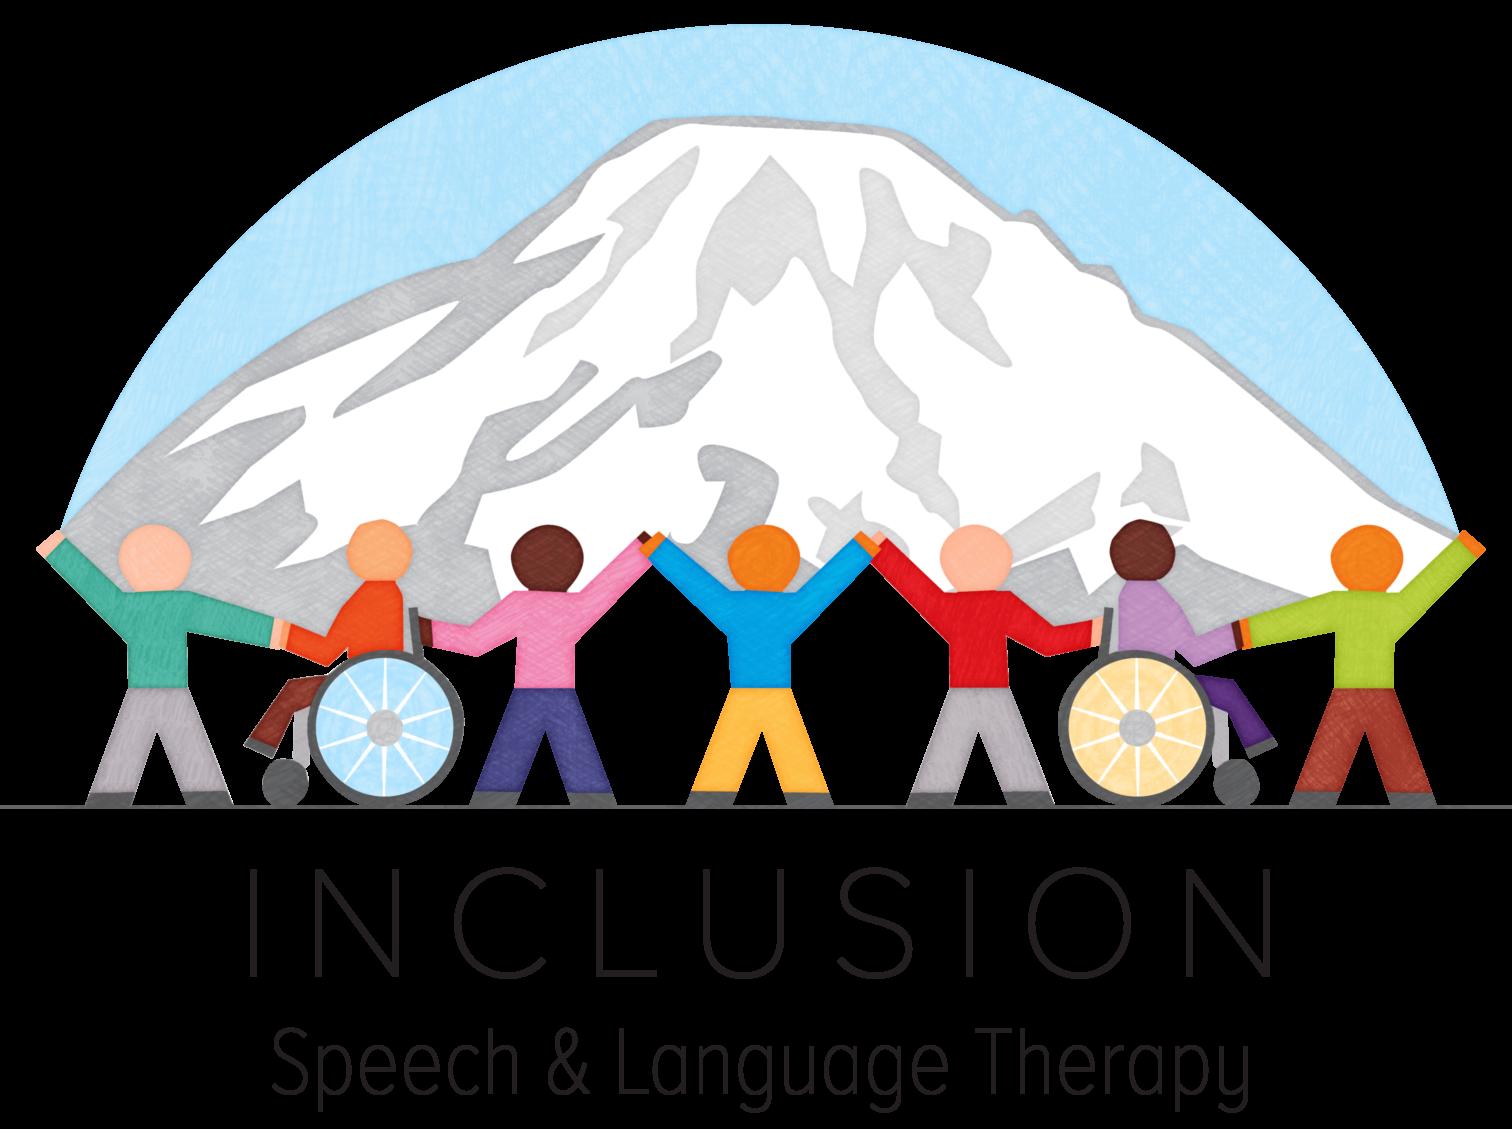 Language speech therapist